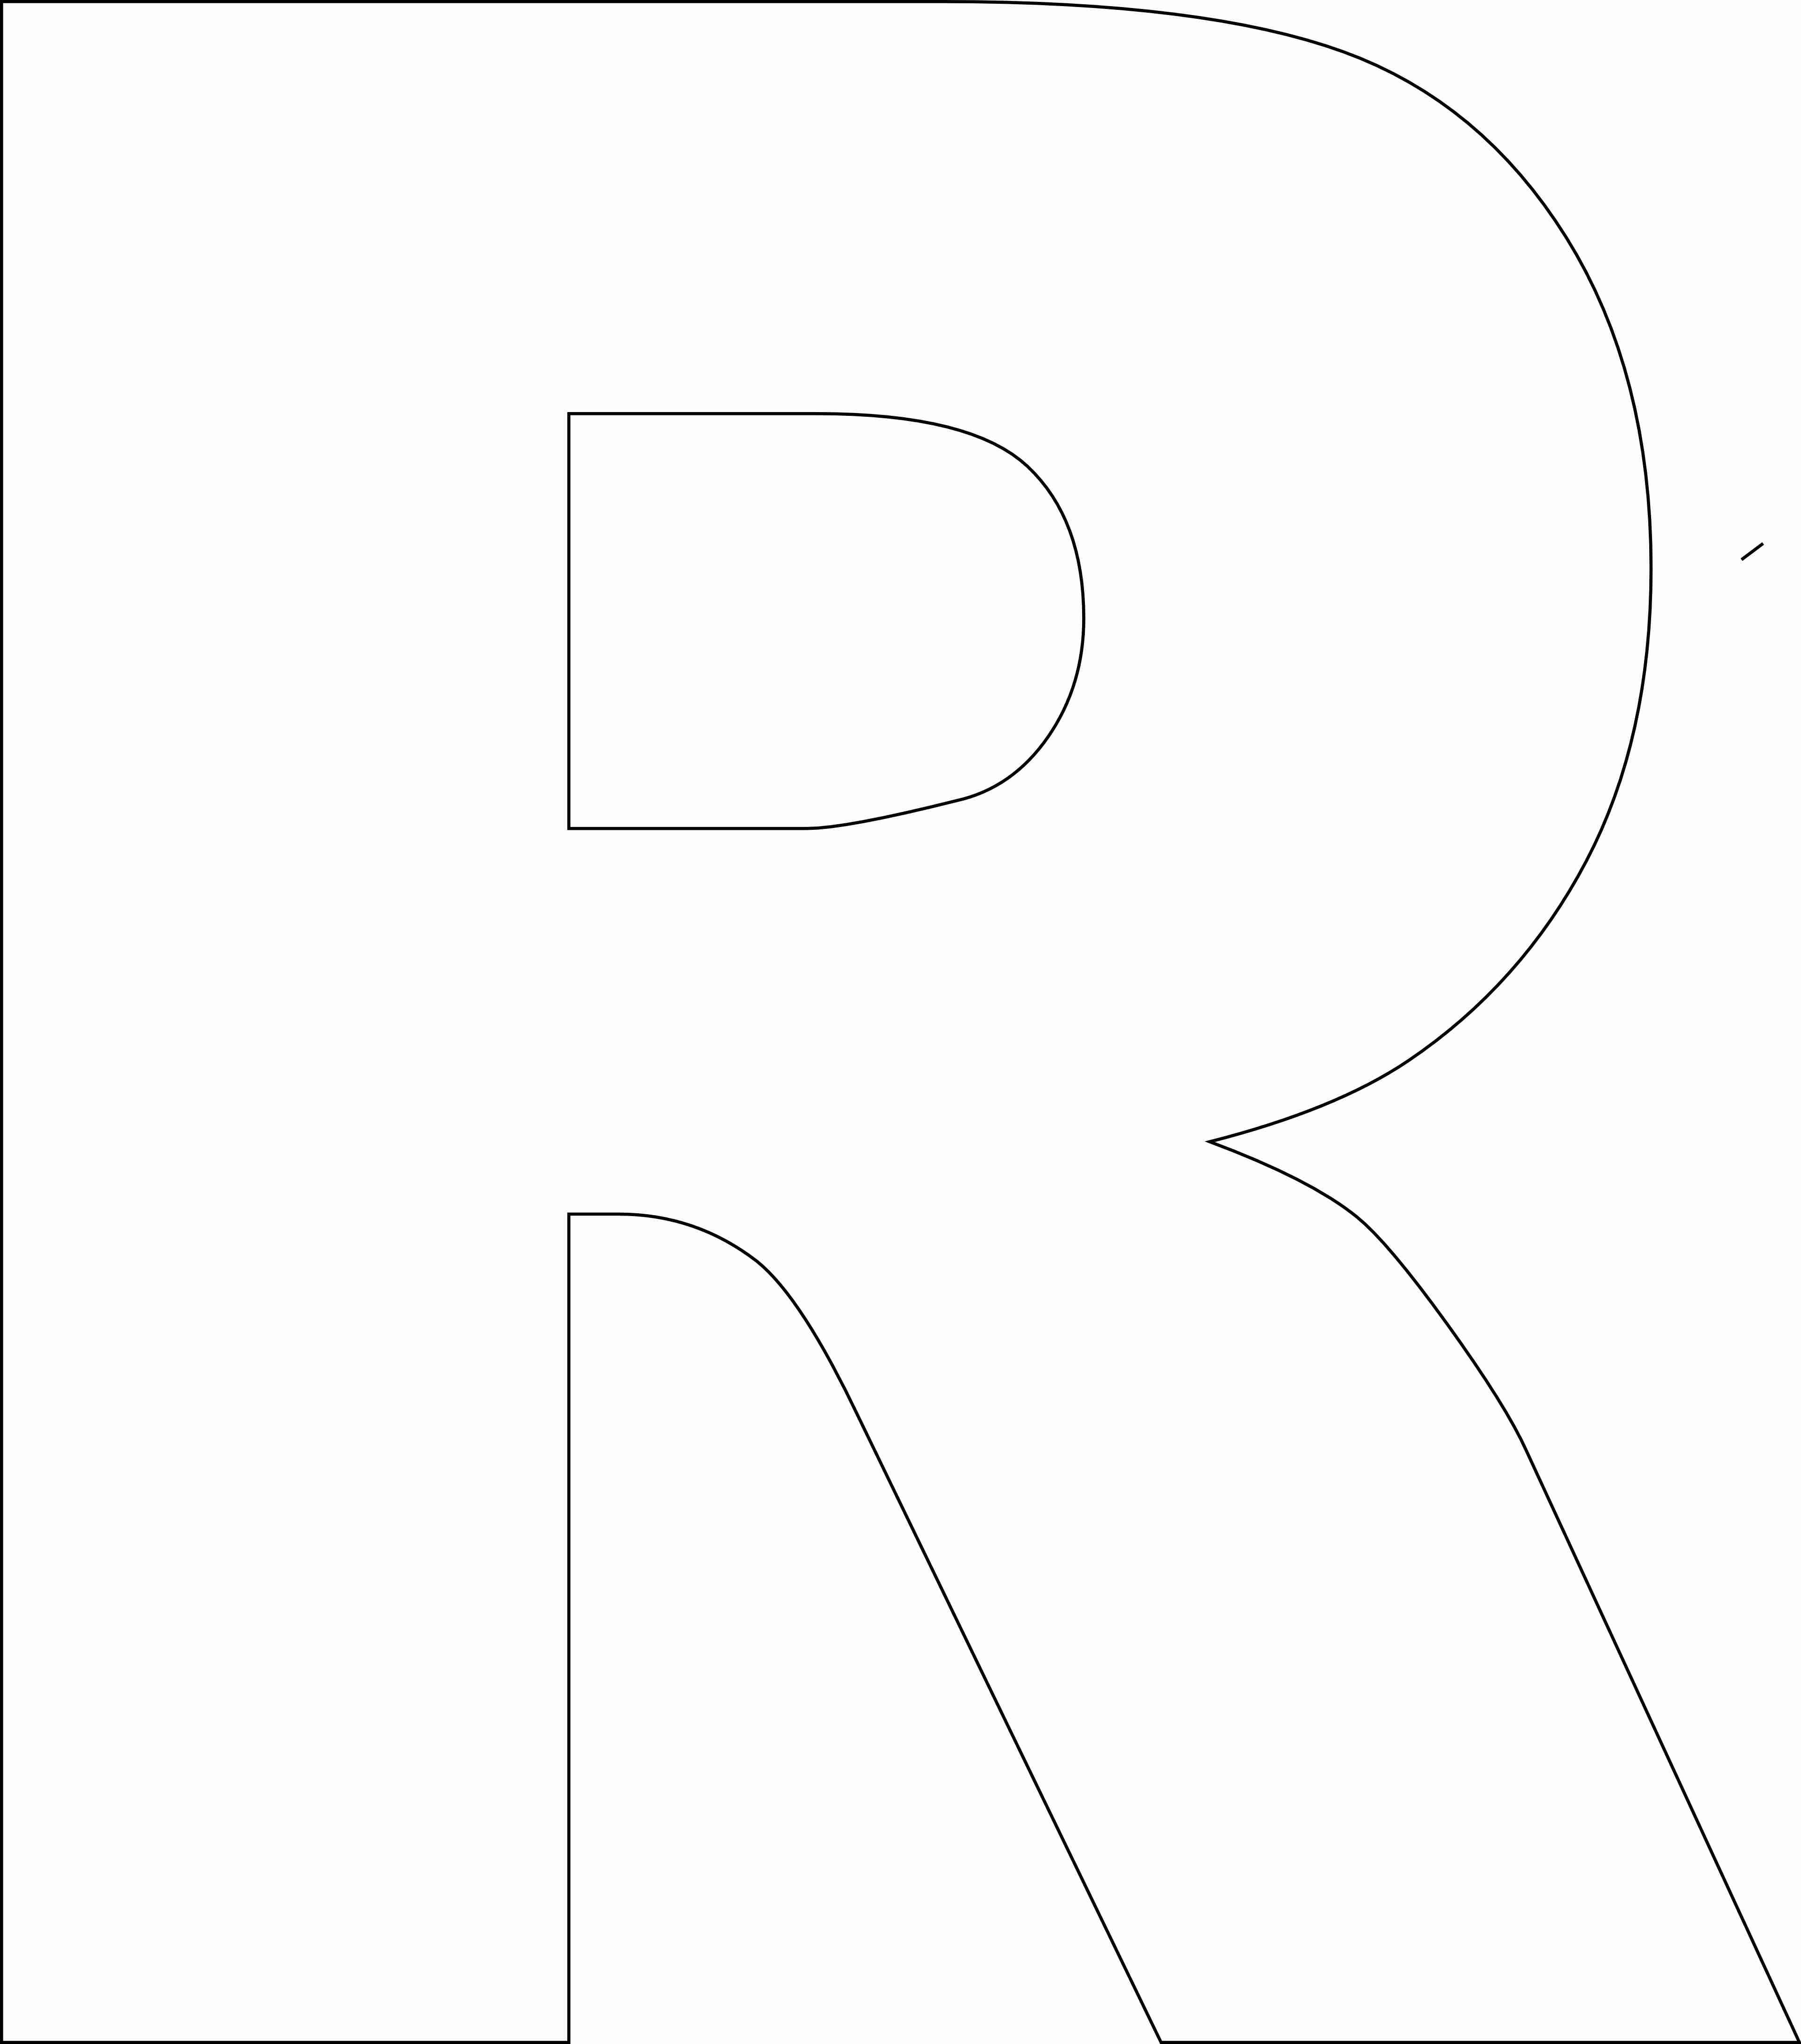 Free Printable Alphabet Template Upper Case - Free Printable Alphabet Stencils To Cut Out